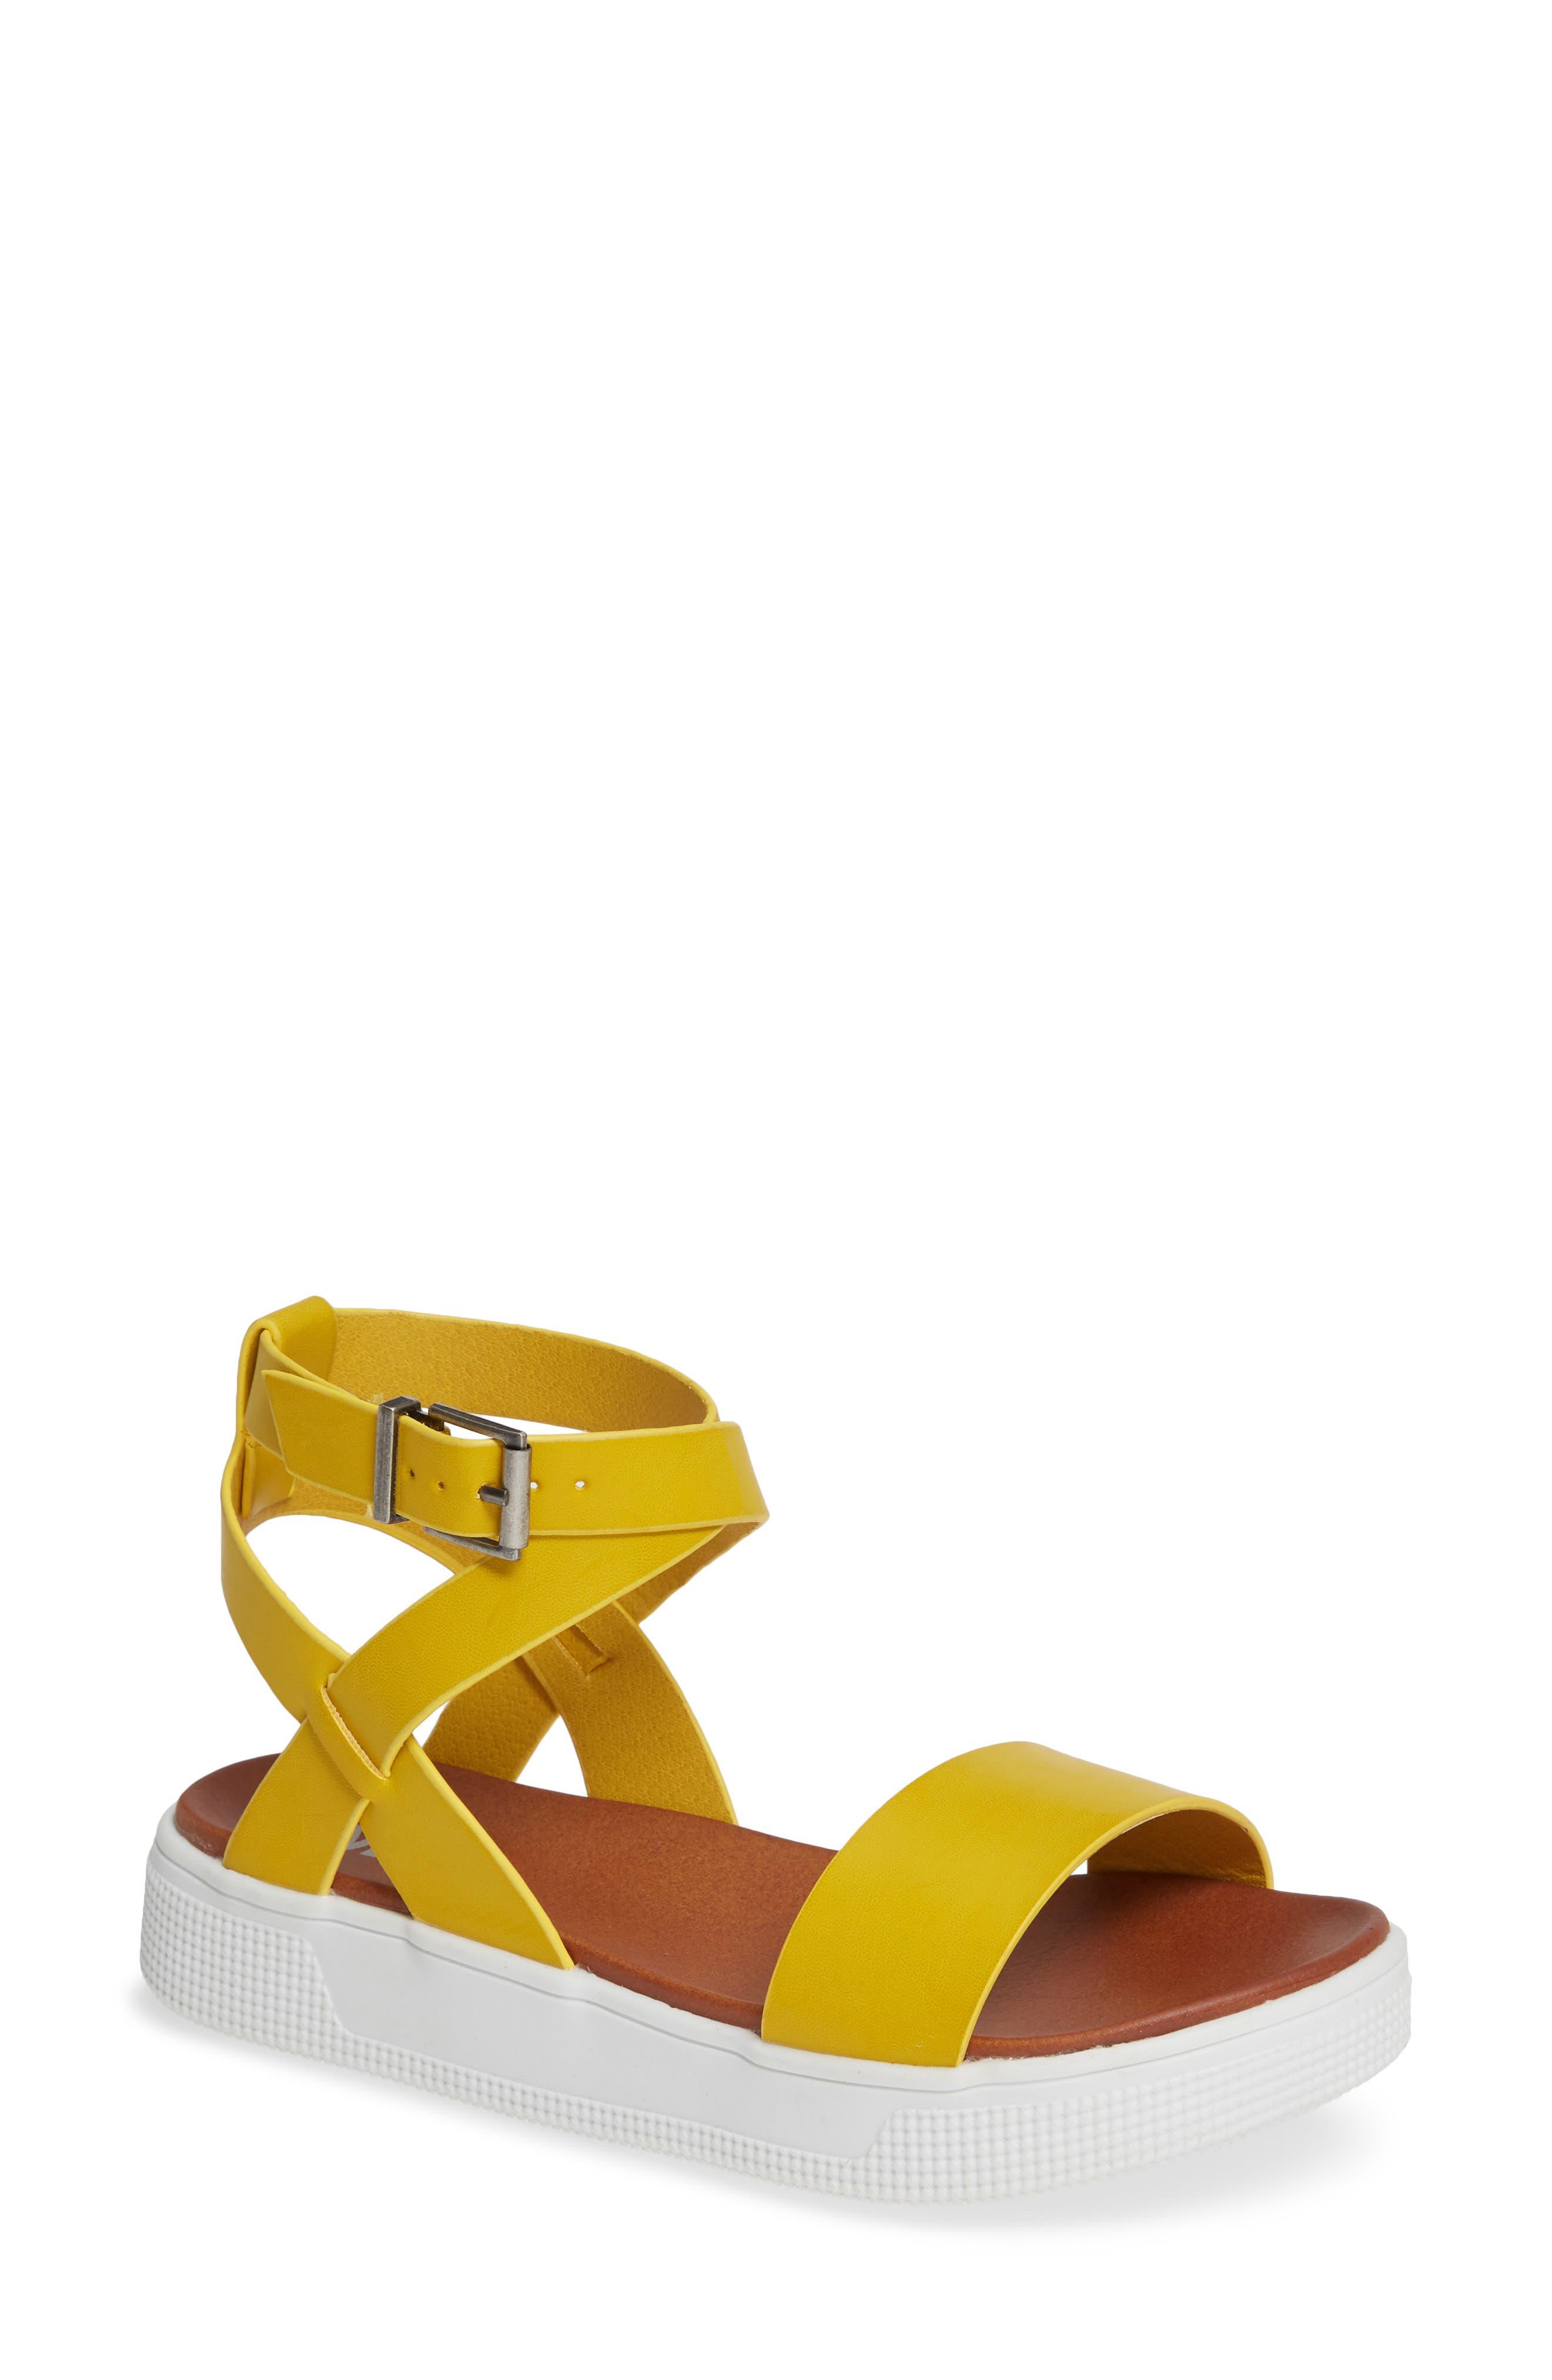 Calla Platform Sandal,                             Main thumbnail 1, color,                             YELLOW FAUX LEATHER